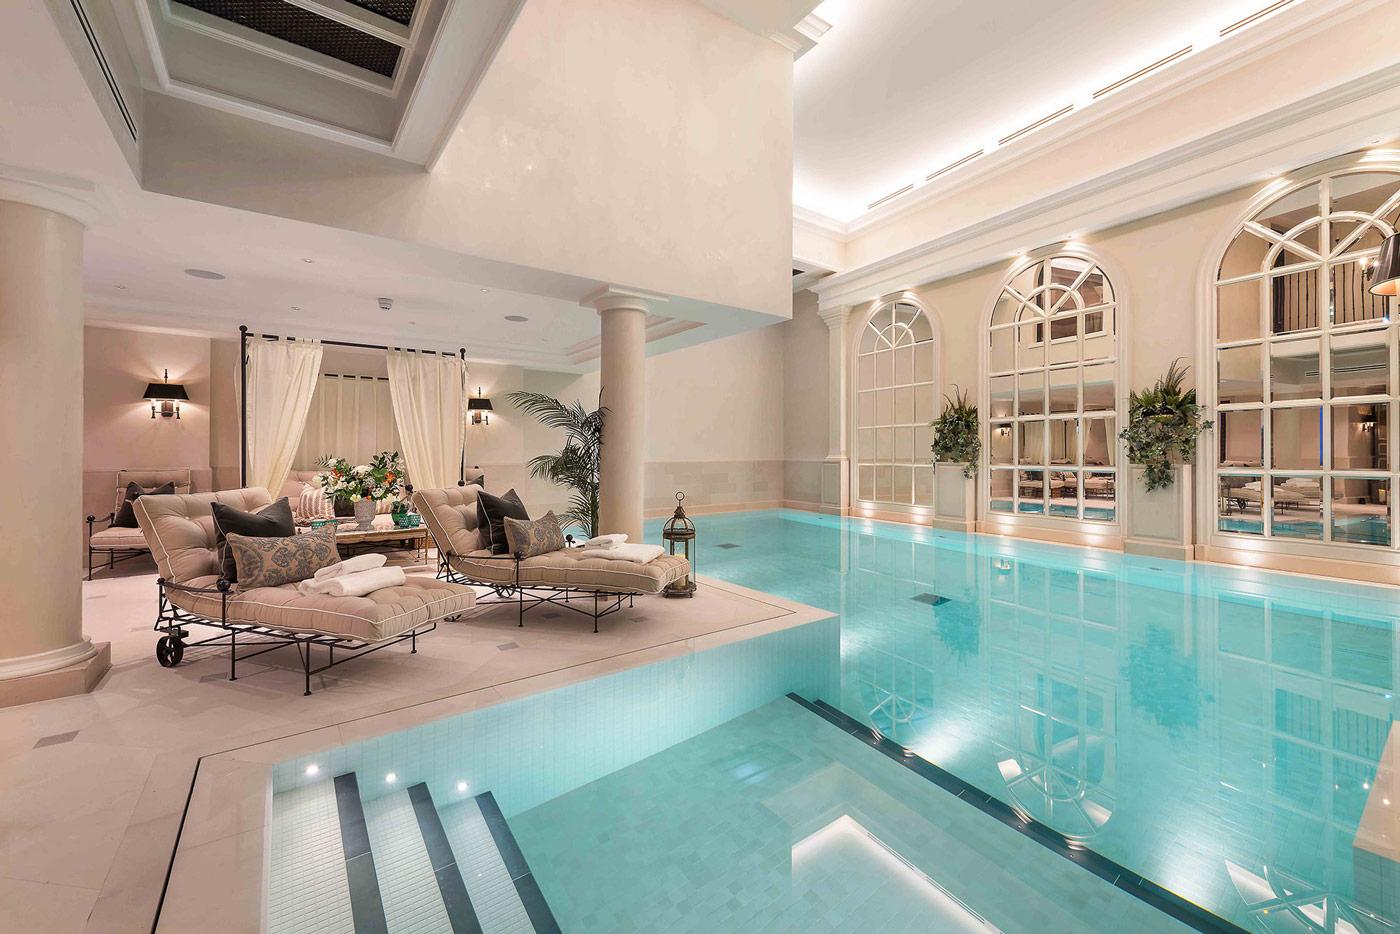 Luxury swimming pool design construction company london for Pool design uk